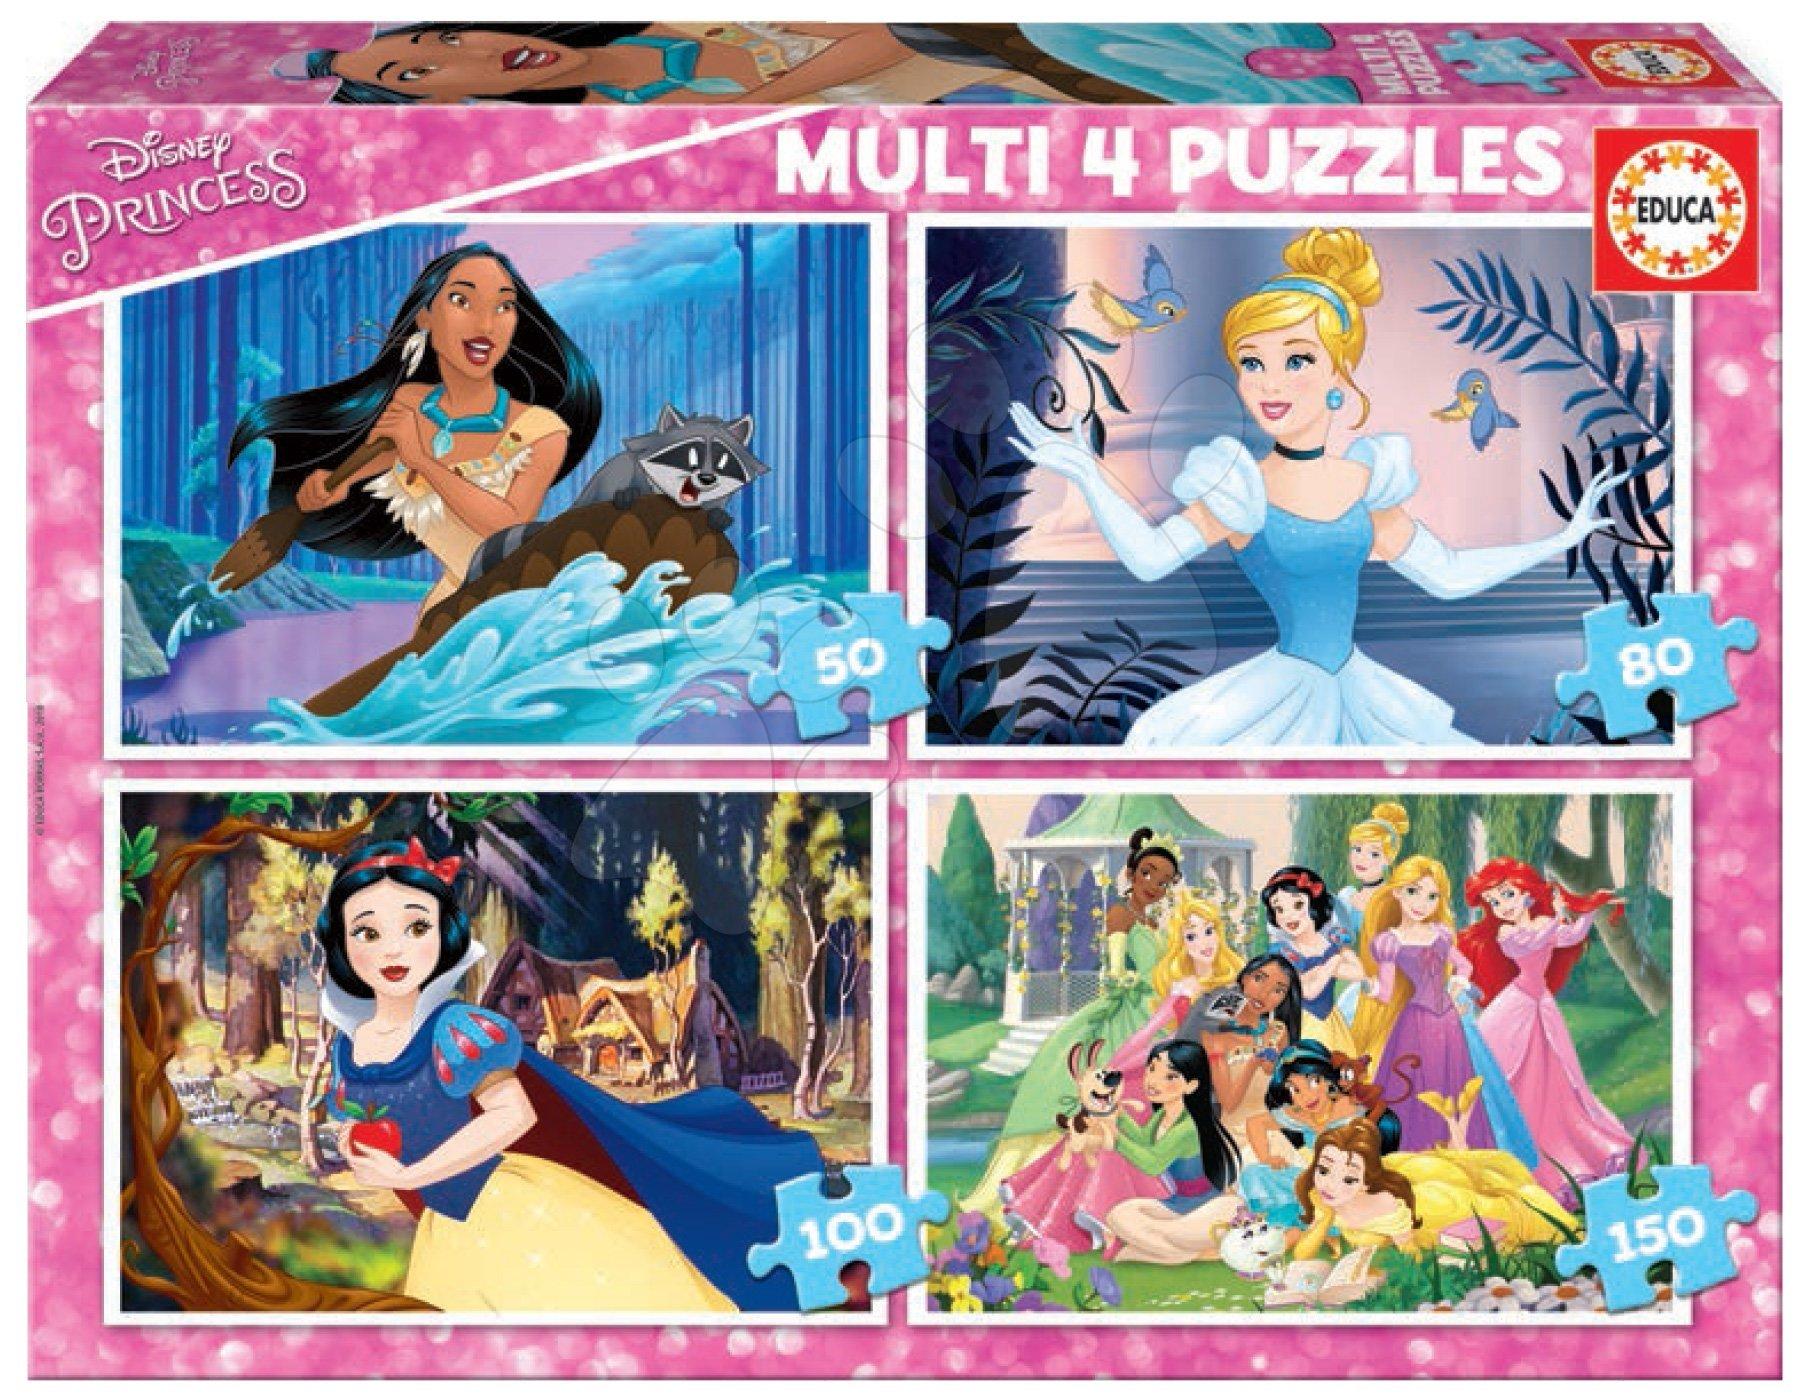 Educa detské puzzle Multi 4 Disney Princess 50-80-100-150 dielov 17637